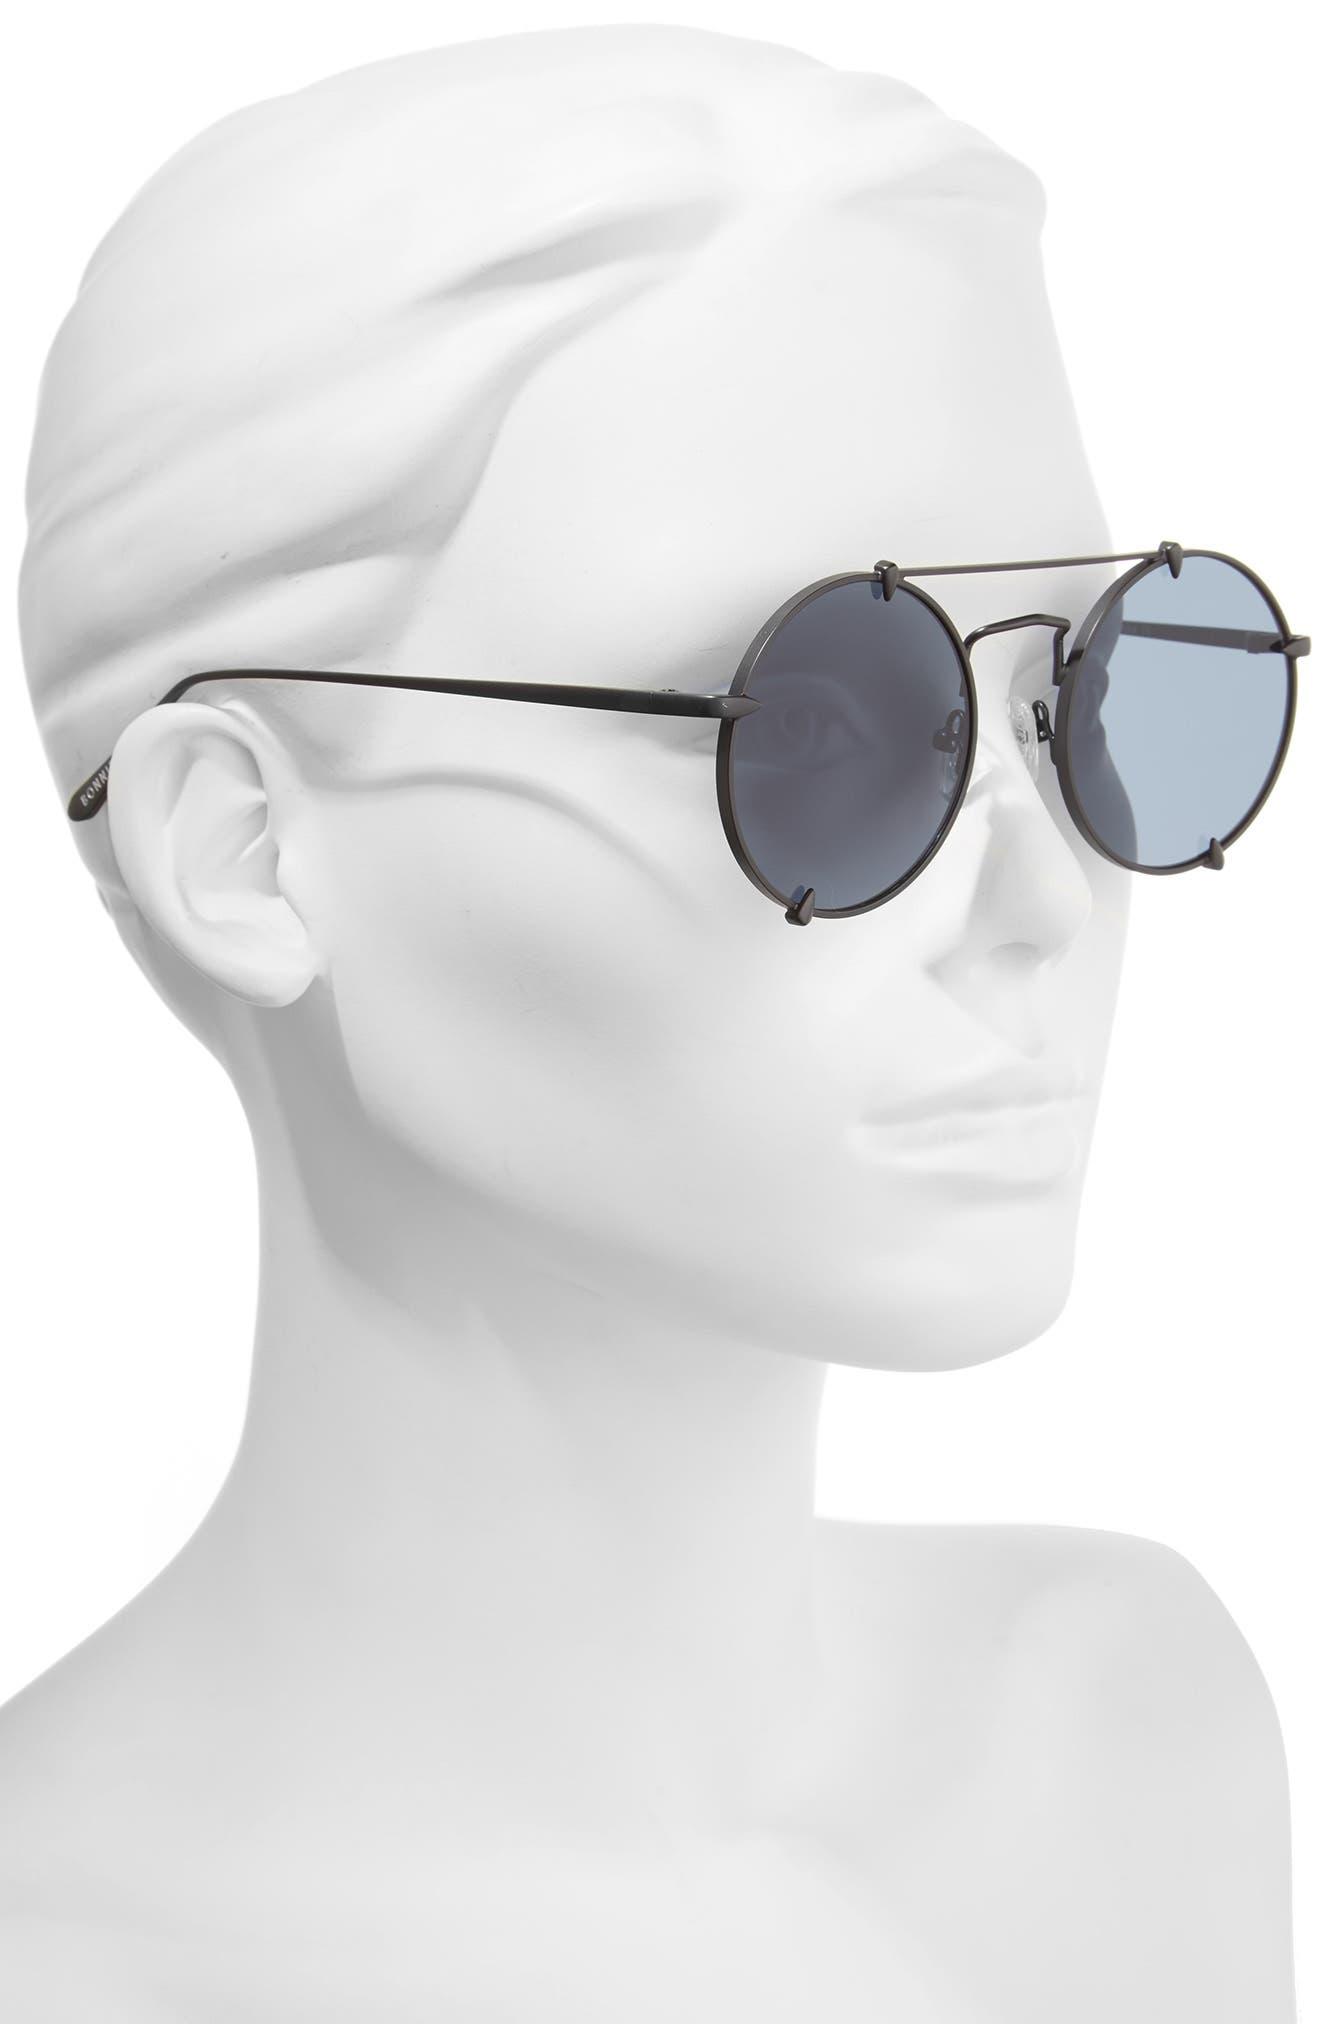 Bonnie Clide Pico 51mm Round Browbar Sunglasses,                             Alternate thumbnail 2, color,                             001